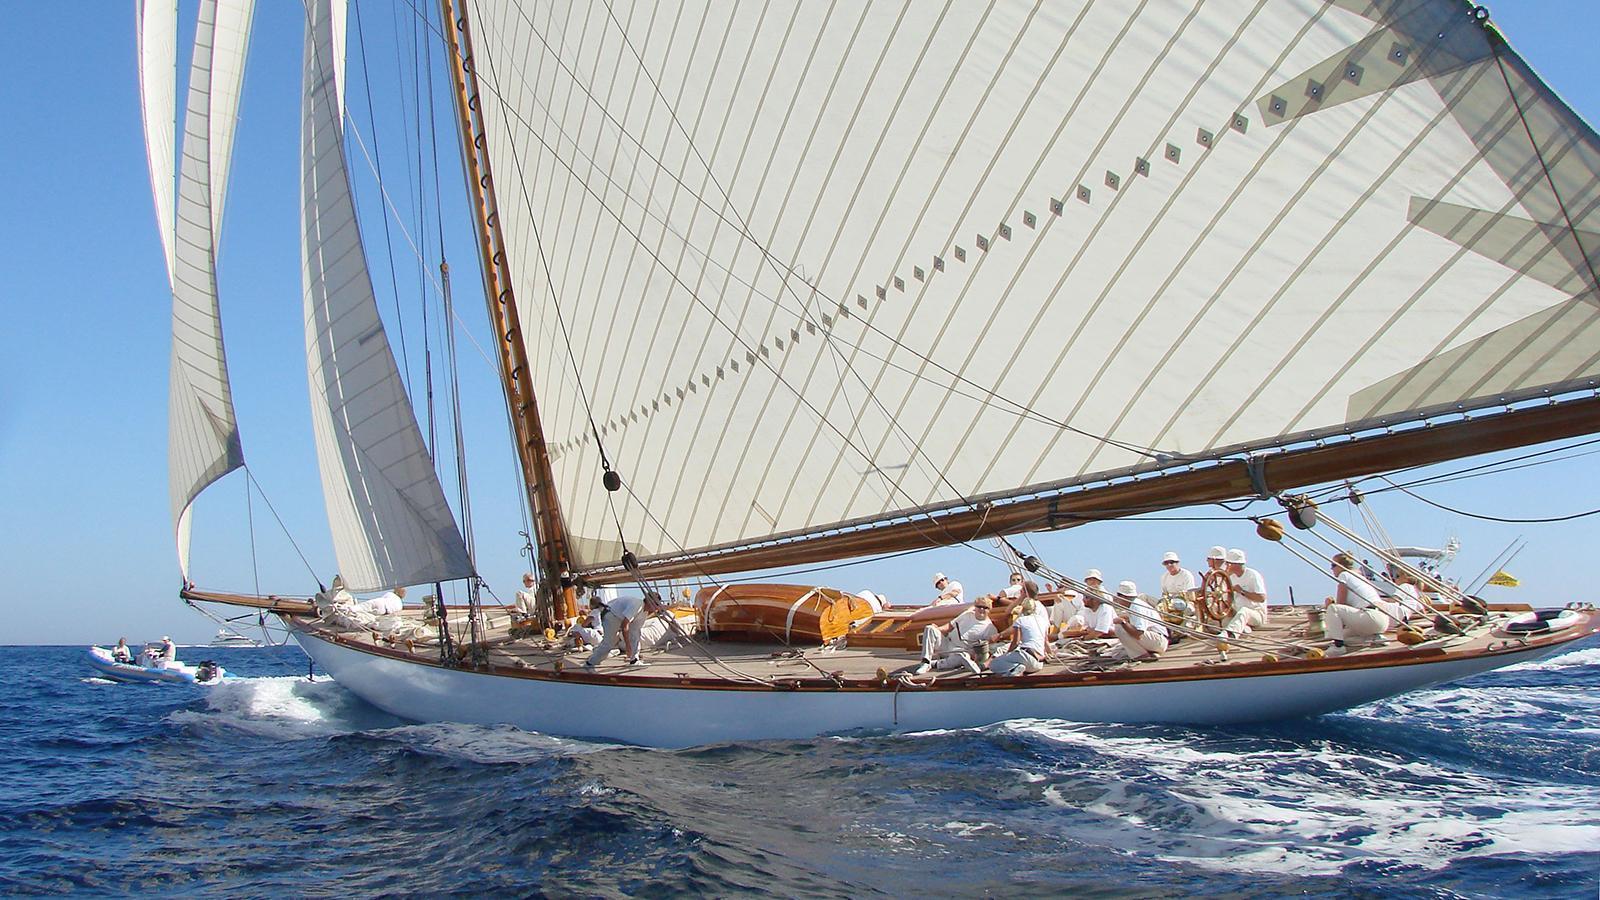 mariquita-yacht-sailing-stern